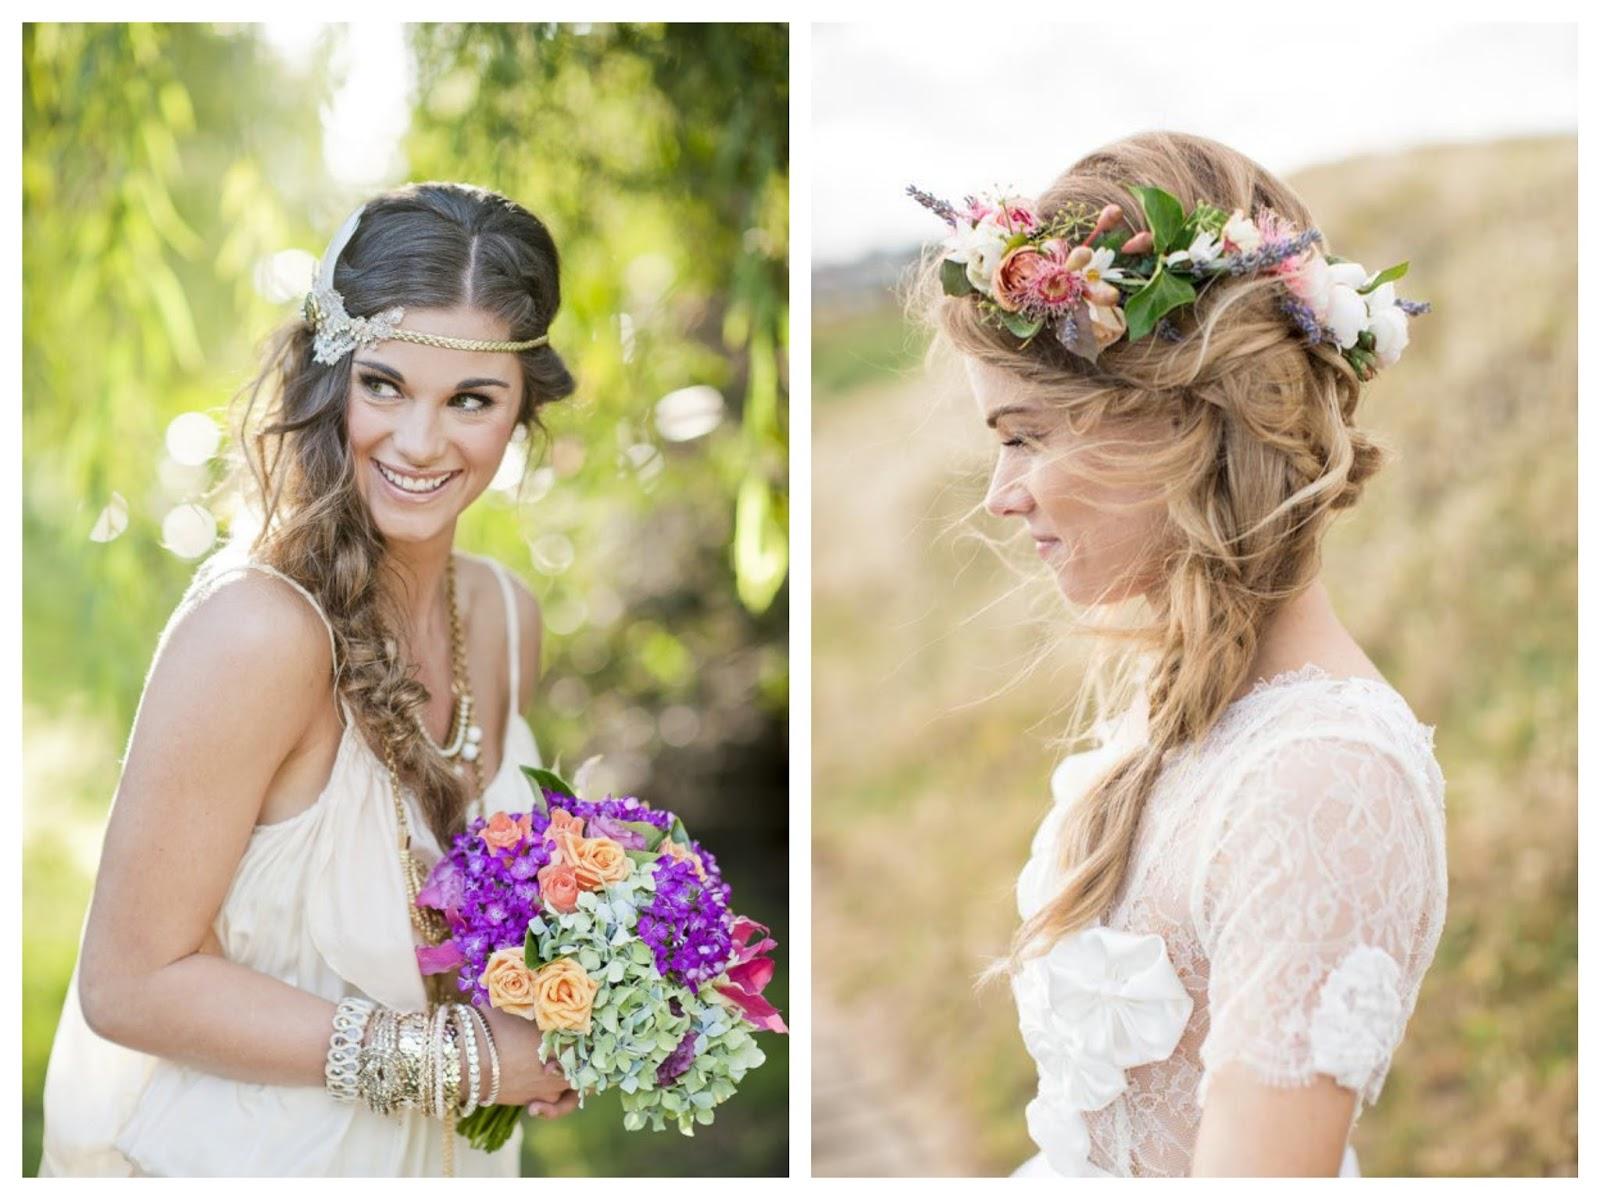 Peinados Para Novias Con Corona - Más de 1000 ideas sobre Peinados Con Tiara en Pinterest Peinado